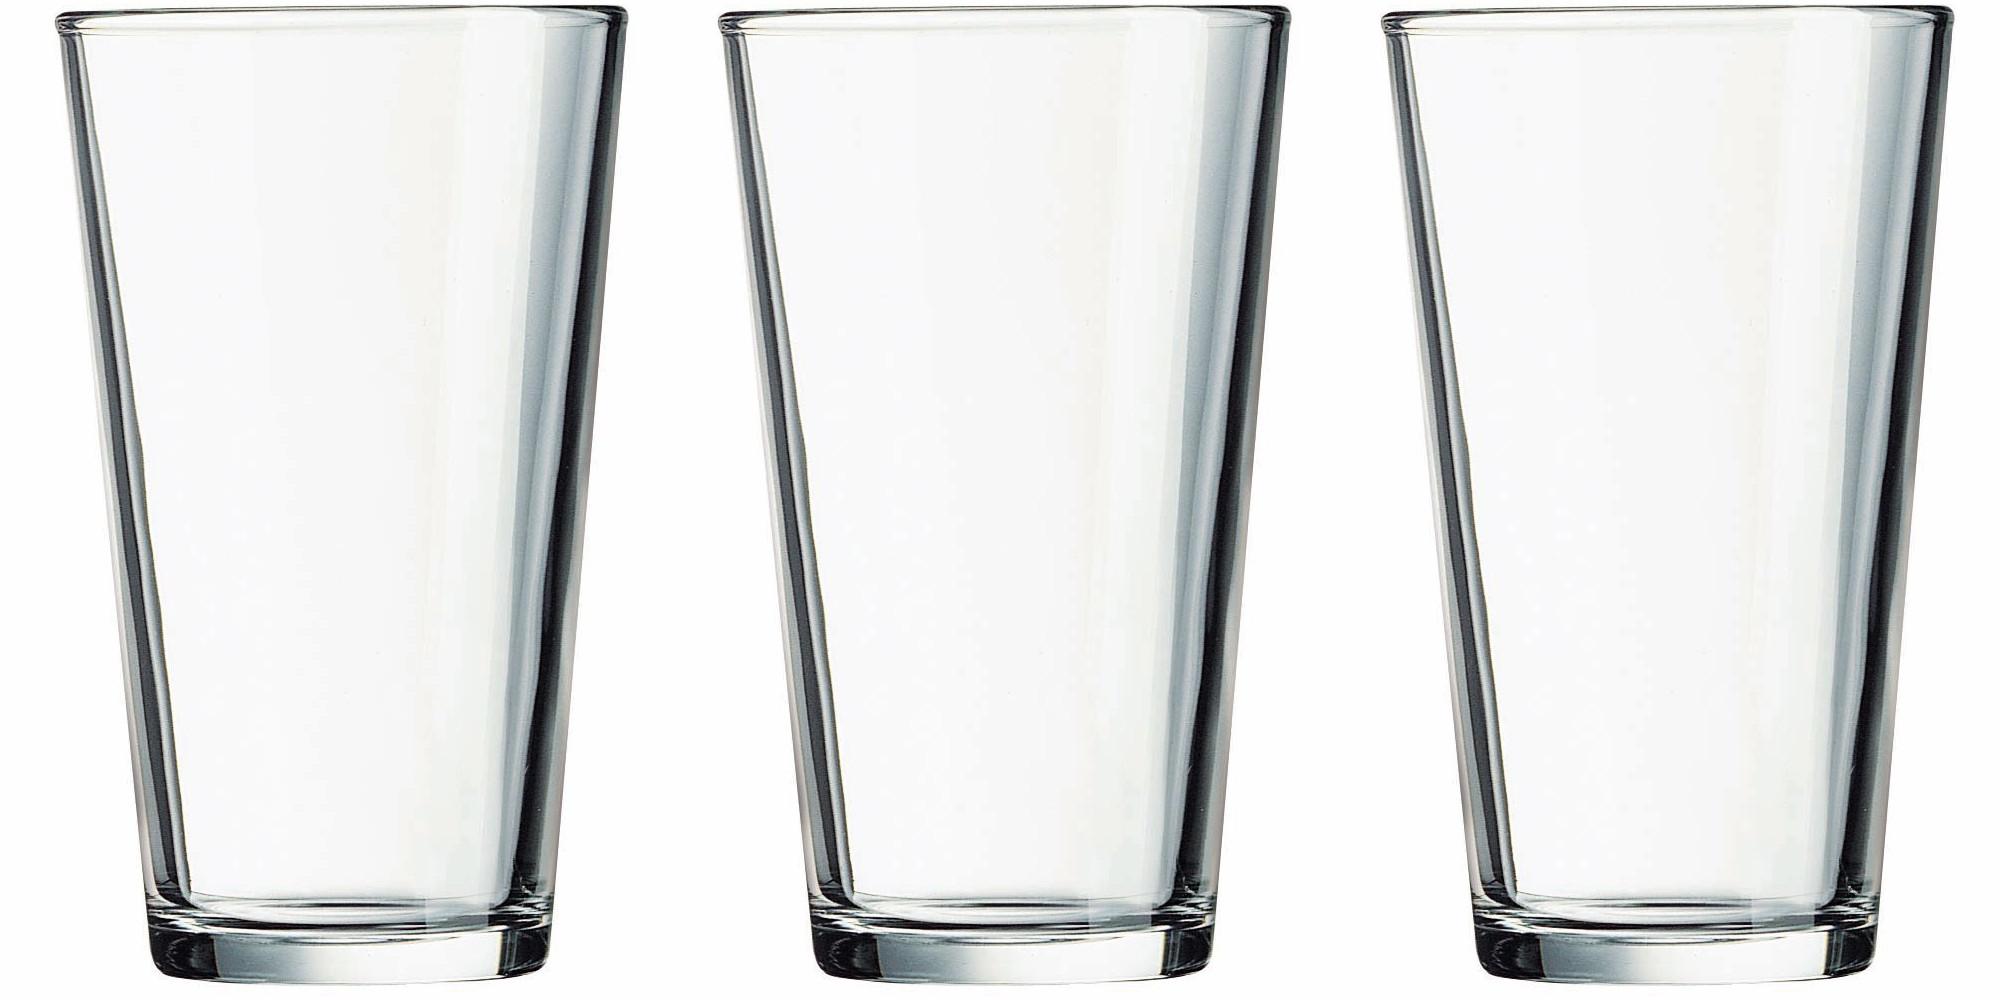 arc-international-luminarc-pub-beer-glasses-2